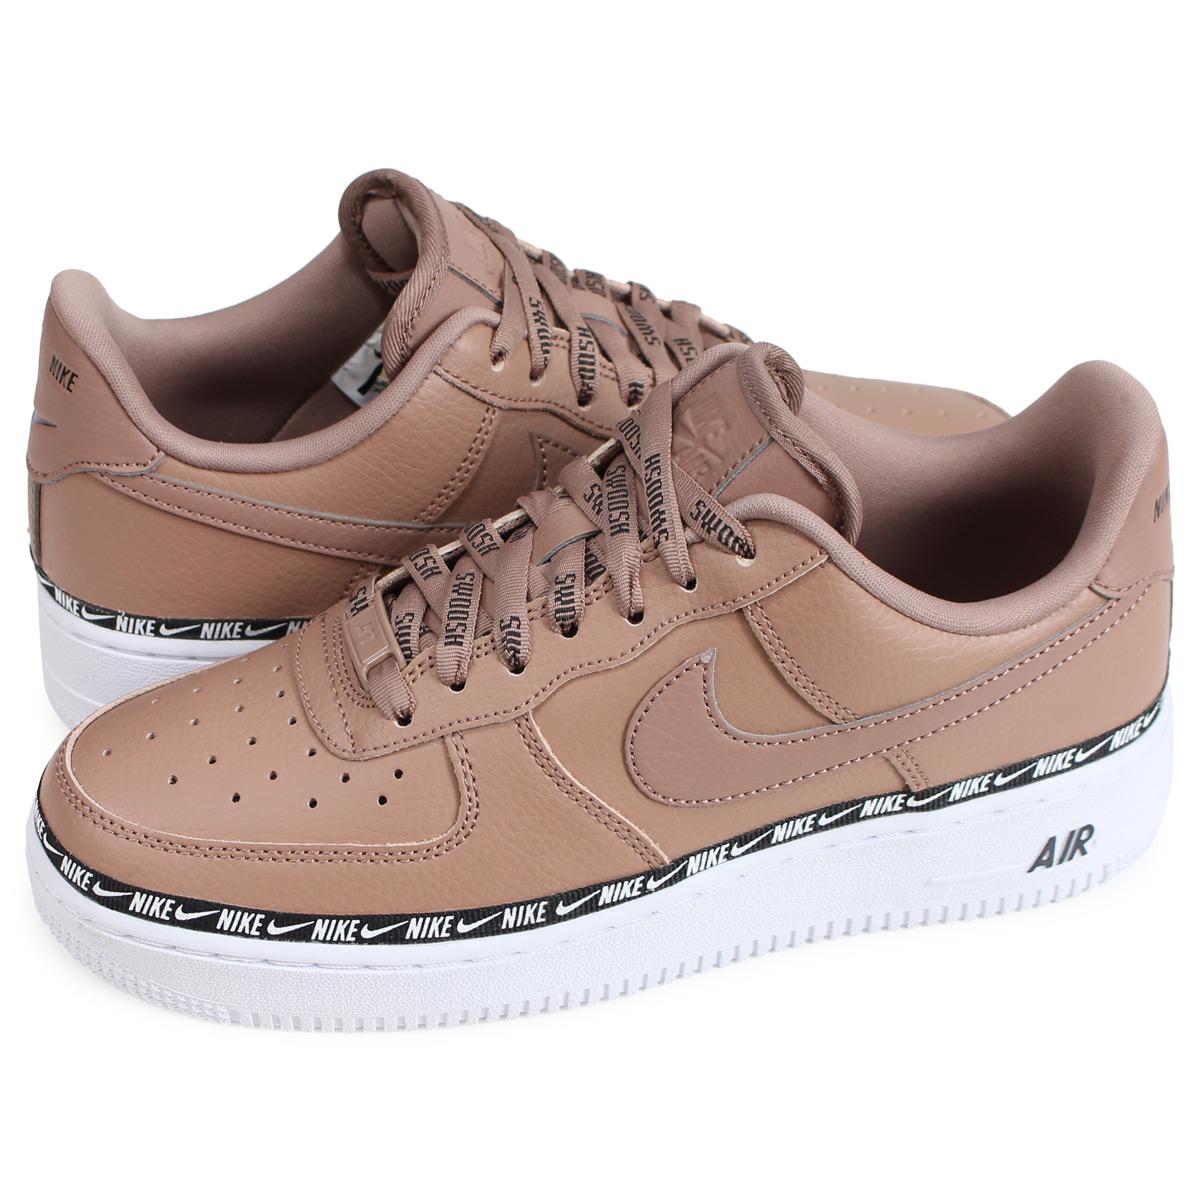 c64b30698aa  brand NIKE getting high popularity from sneakers freak . Constant seller  model